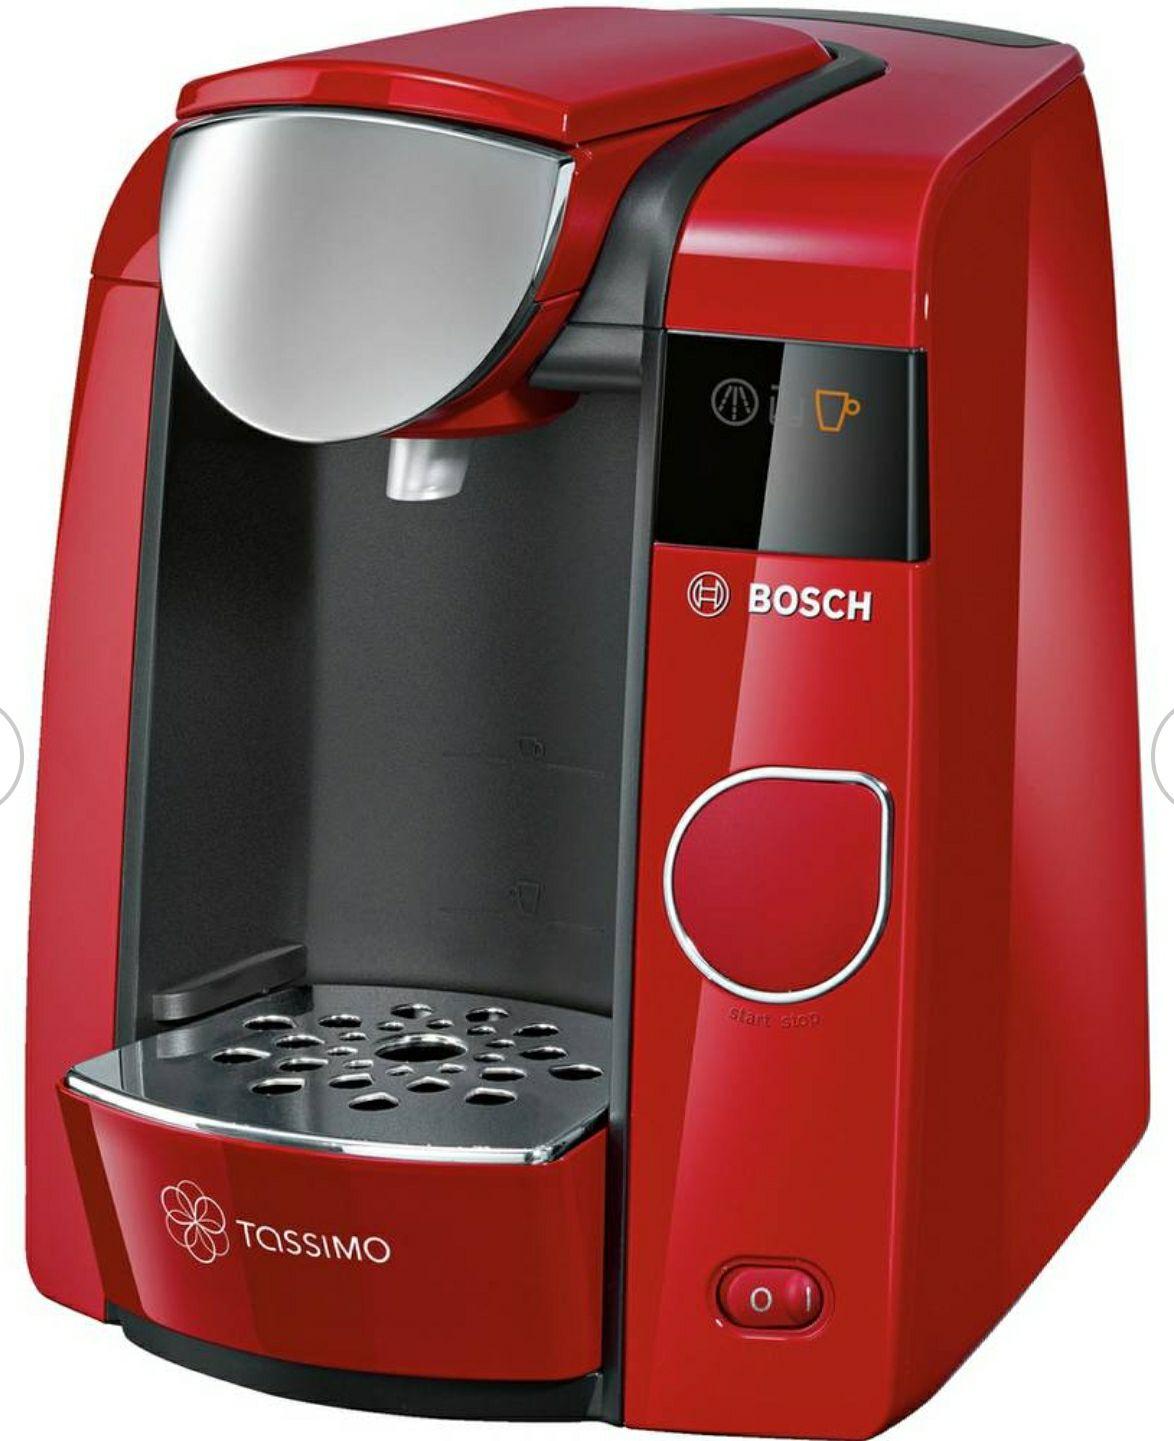 Tassimo by Bosch Joy Pod Coffee Machine - Red £34.99 @ Argos